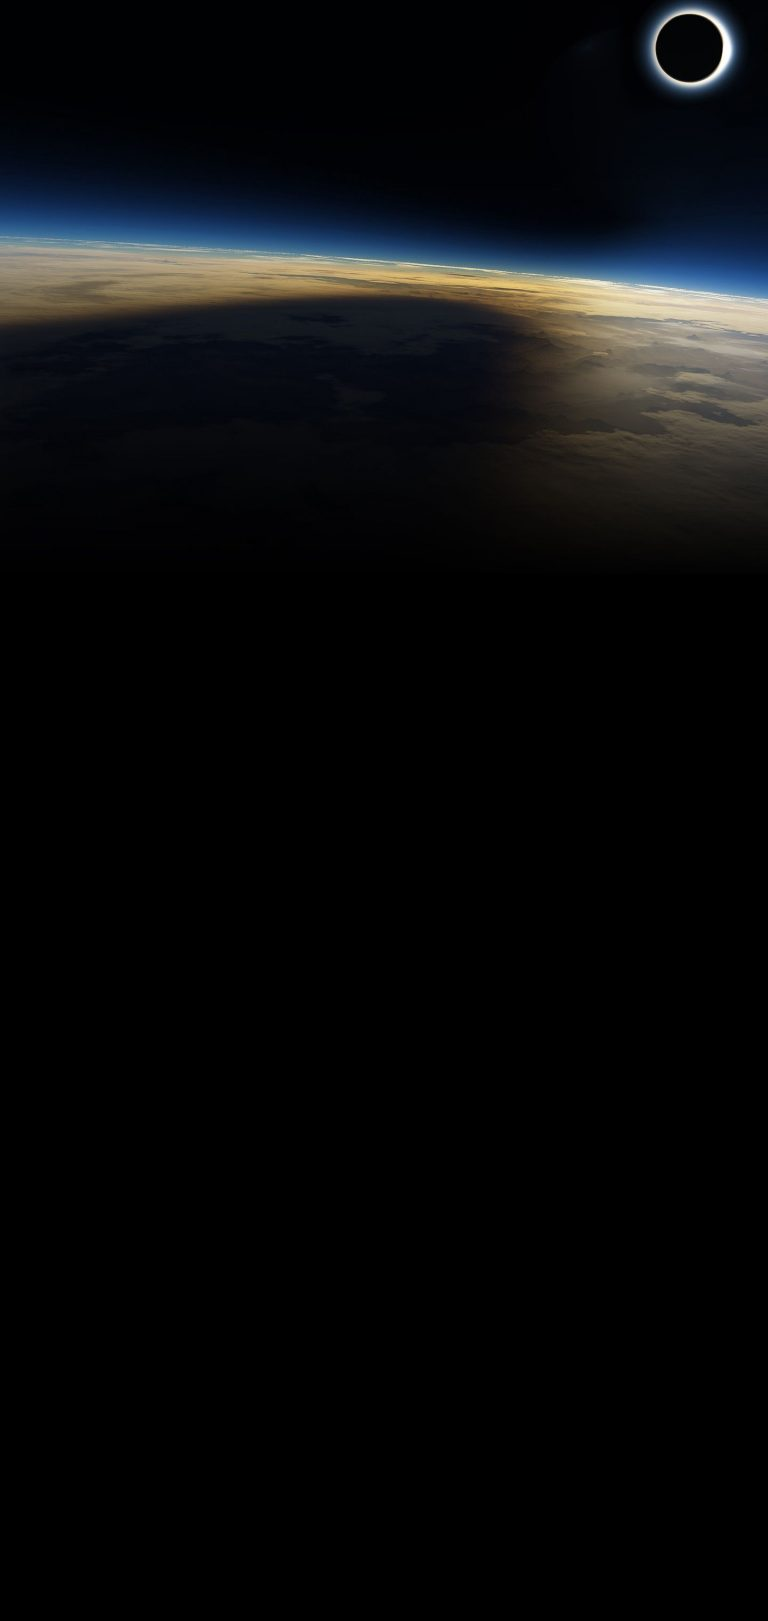 Samsung Galaxy S10 Hole Punch Wallpaper 28 1440x3040 768x1621